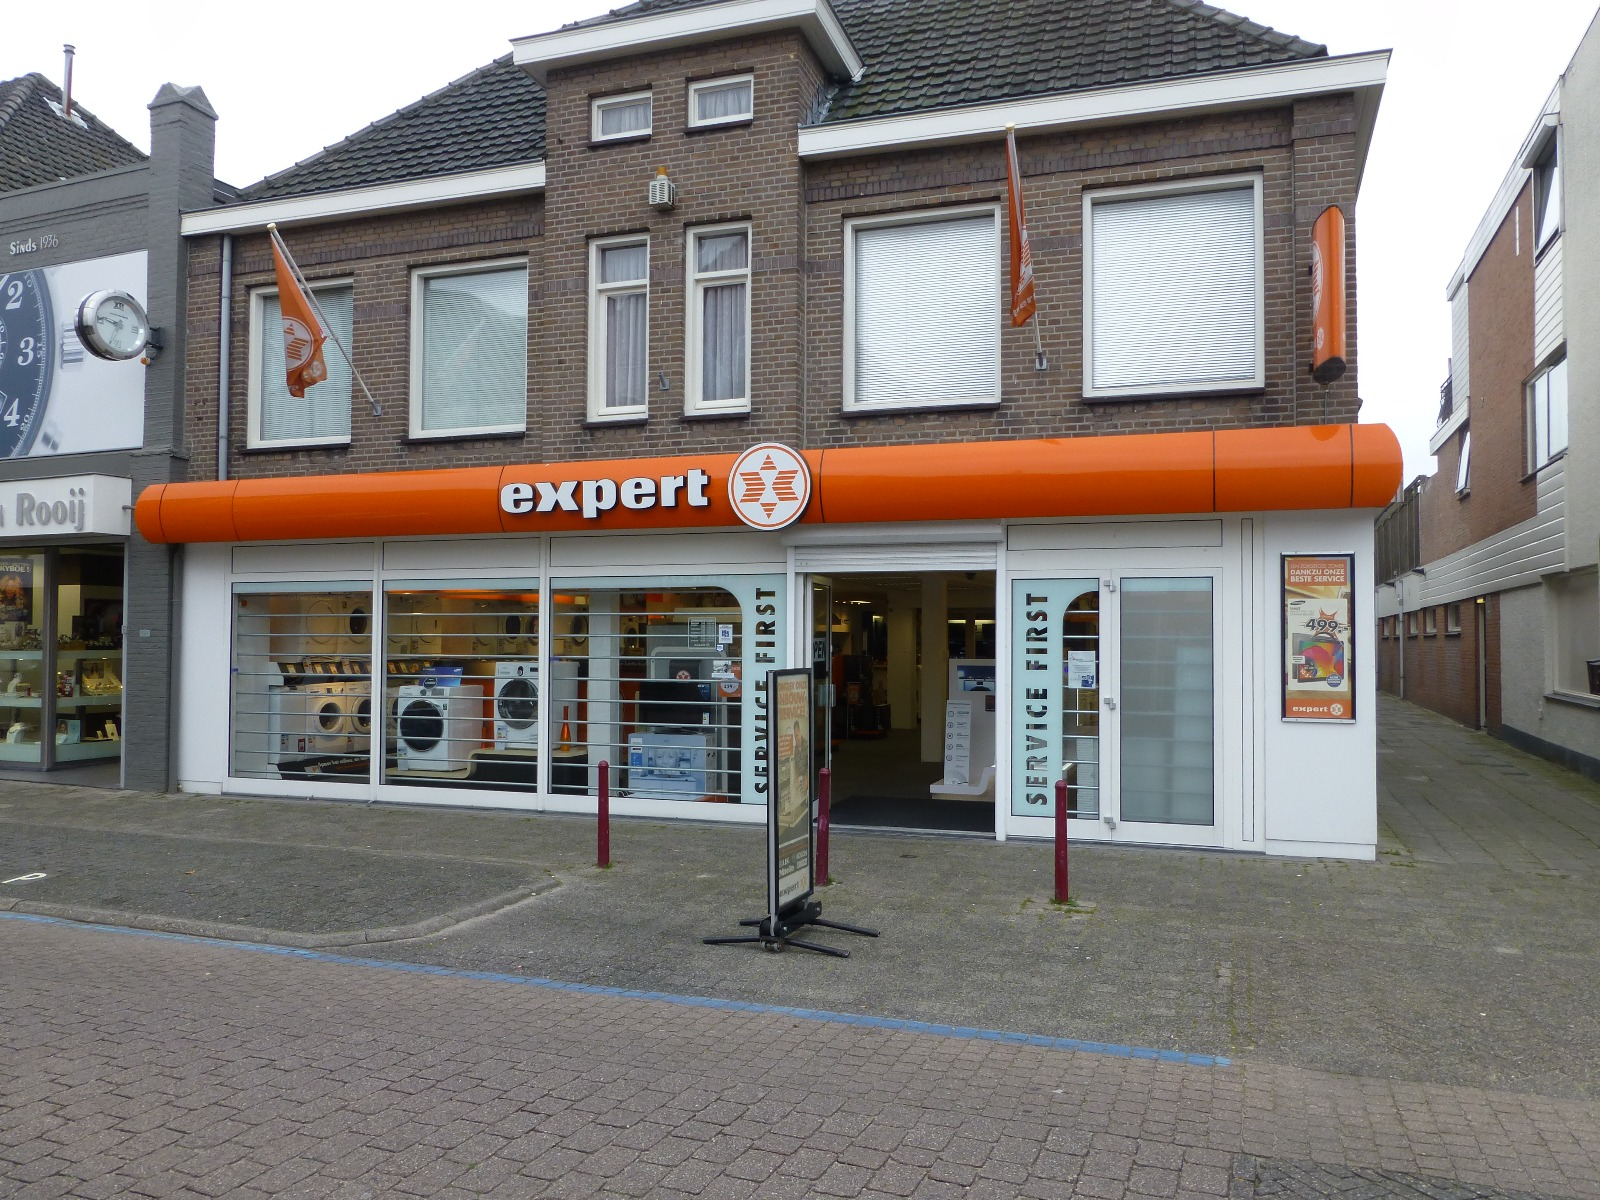 expert kaatsheuvel expert nl